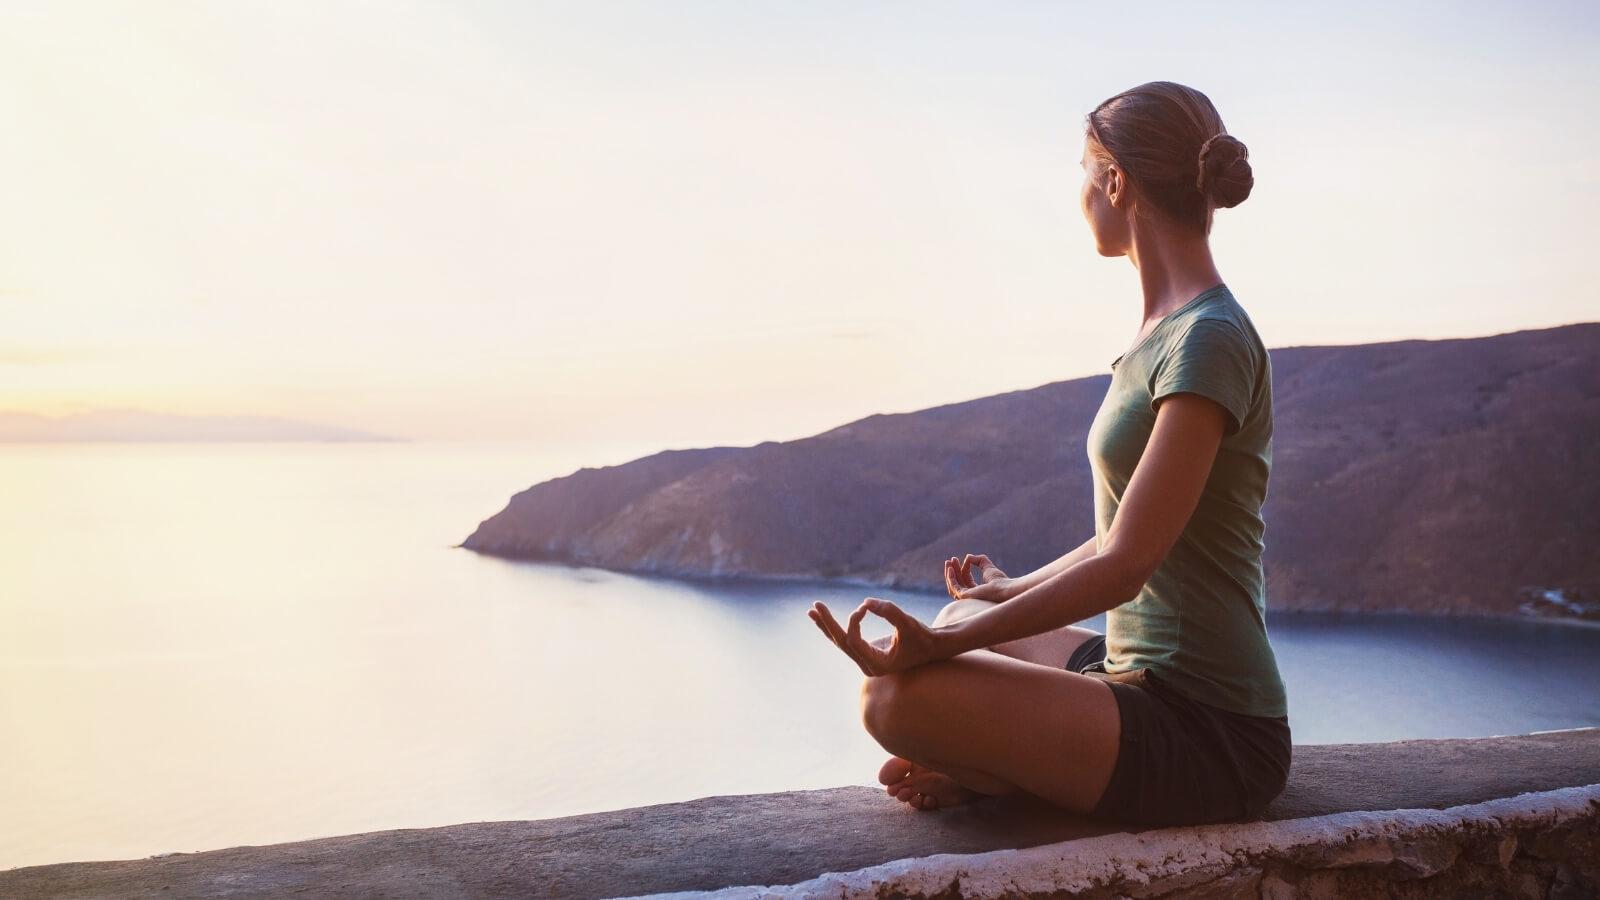 Frau macht Yoga am Meer - Meditation lernen